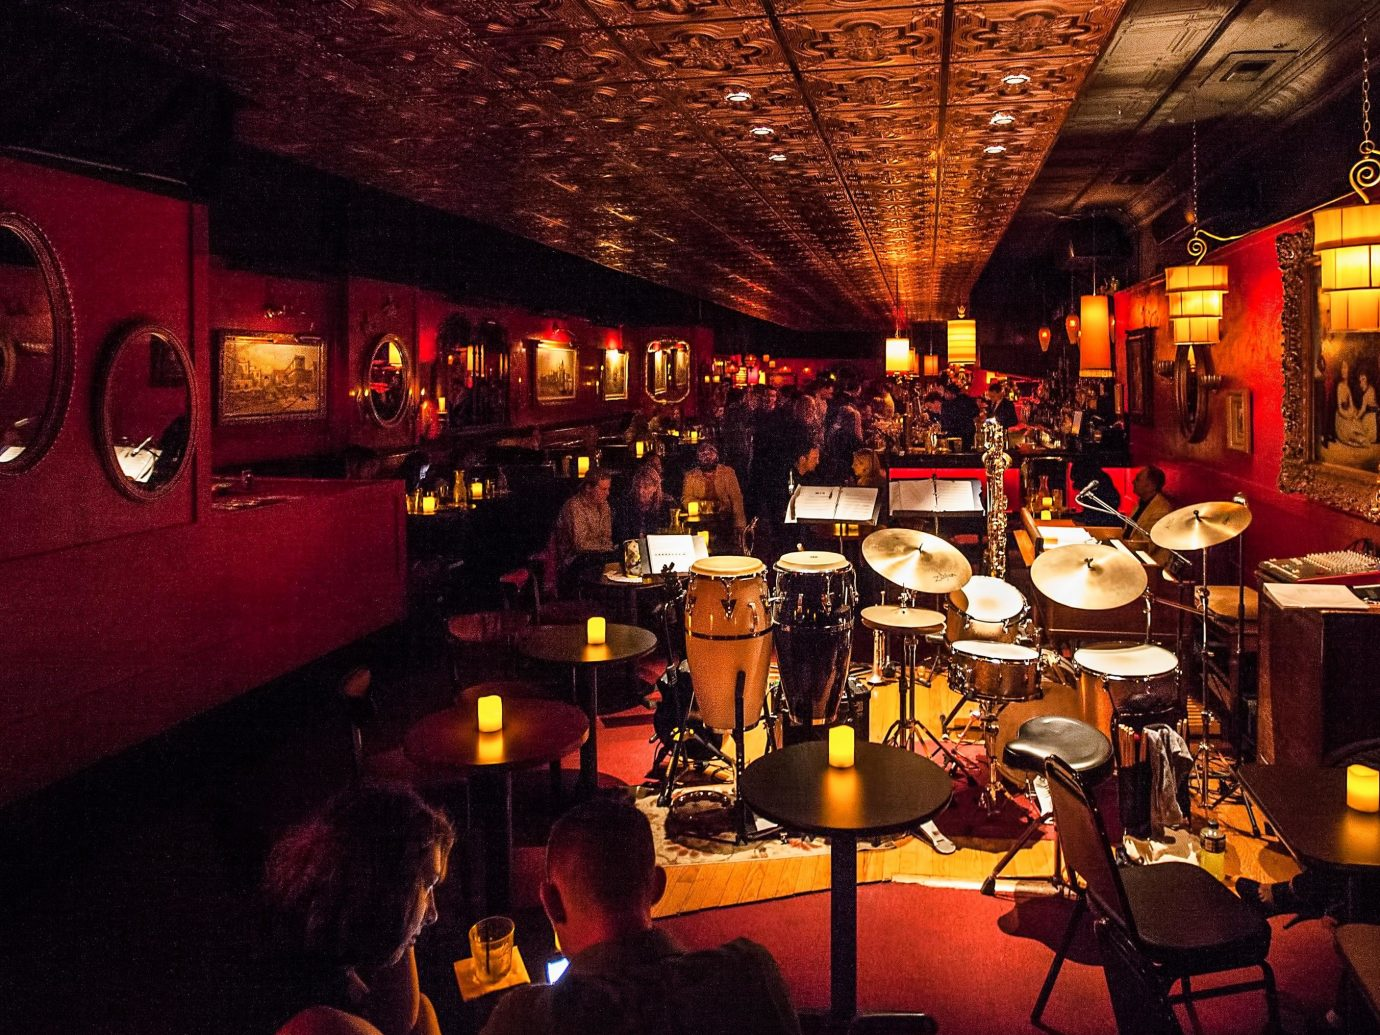 City Kansas City Midwest Trip Ideas indoor ceiling restaurant Bar pub tavern jazz club night interior design